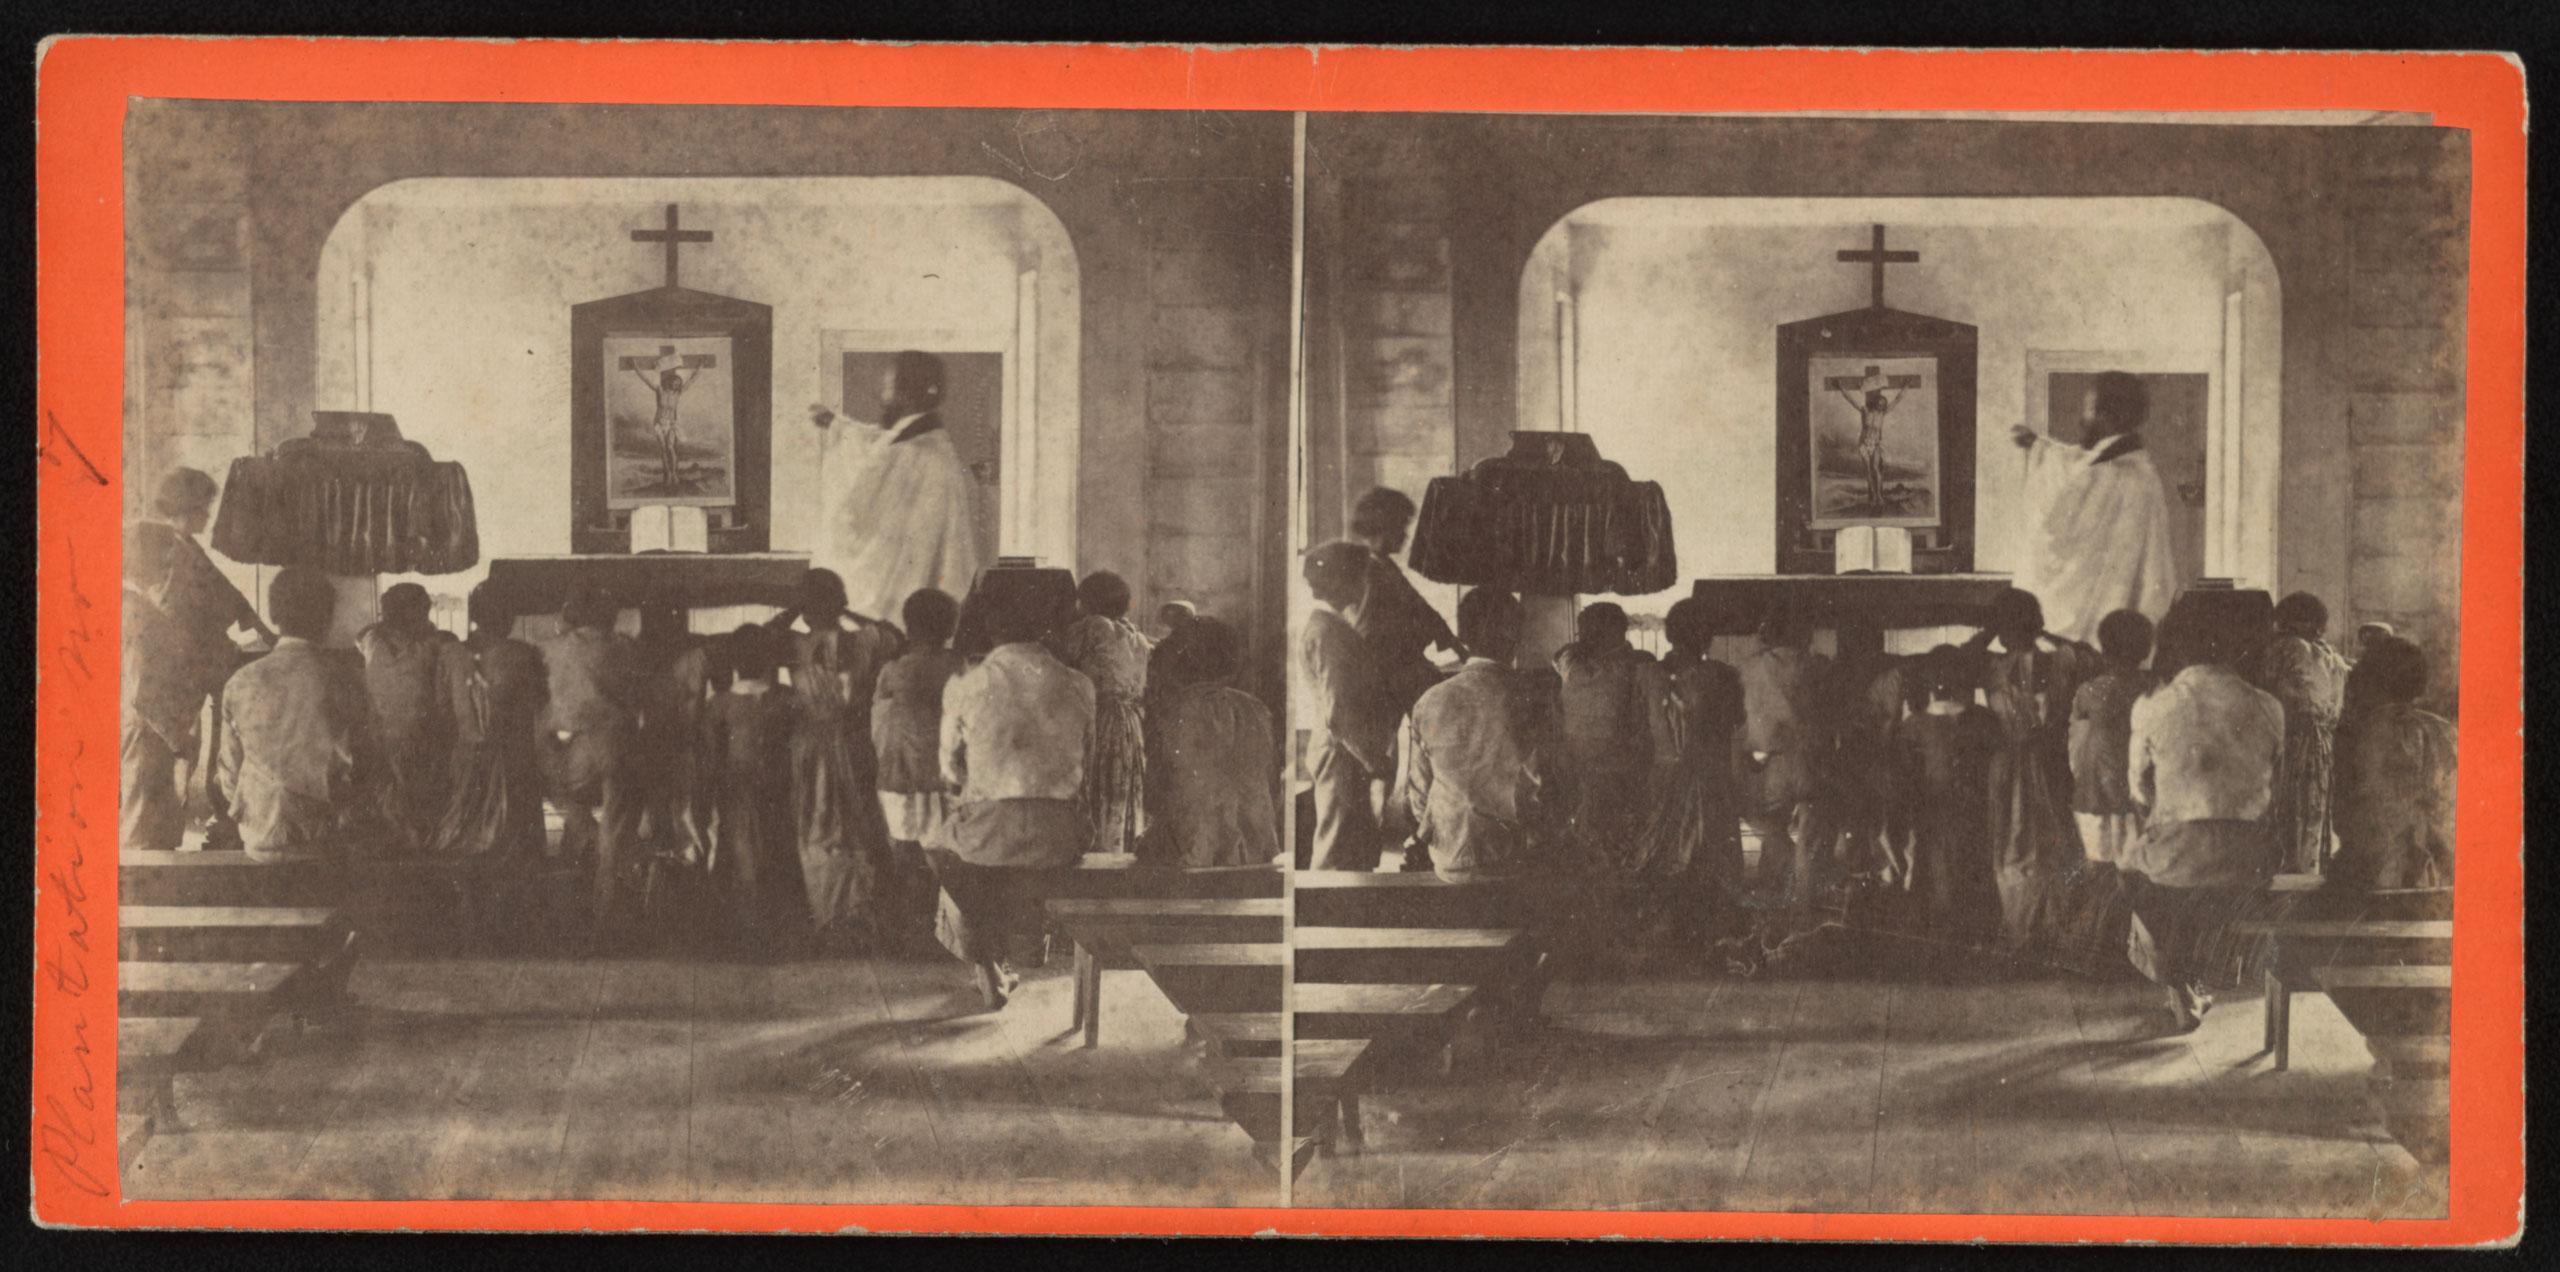 Rockville Plantation negro church,  Charleston, S.C., Jan. 31, 1863.